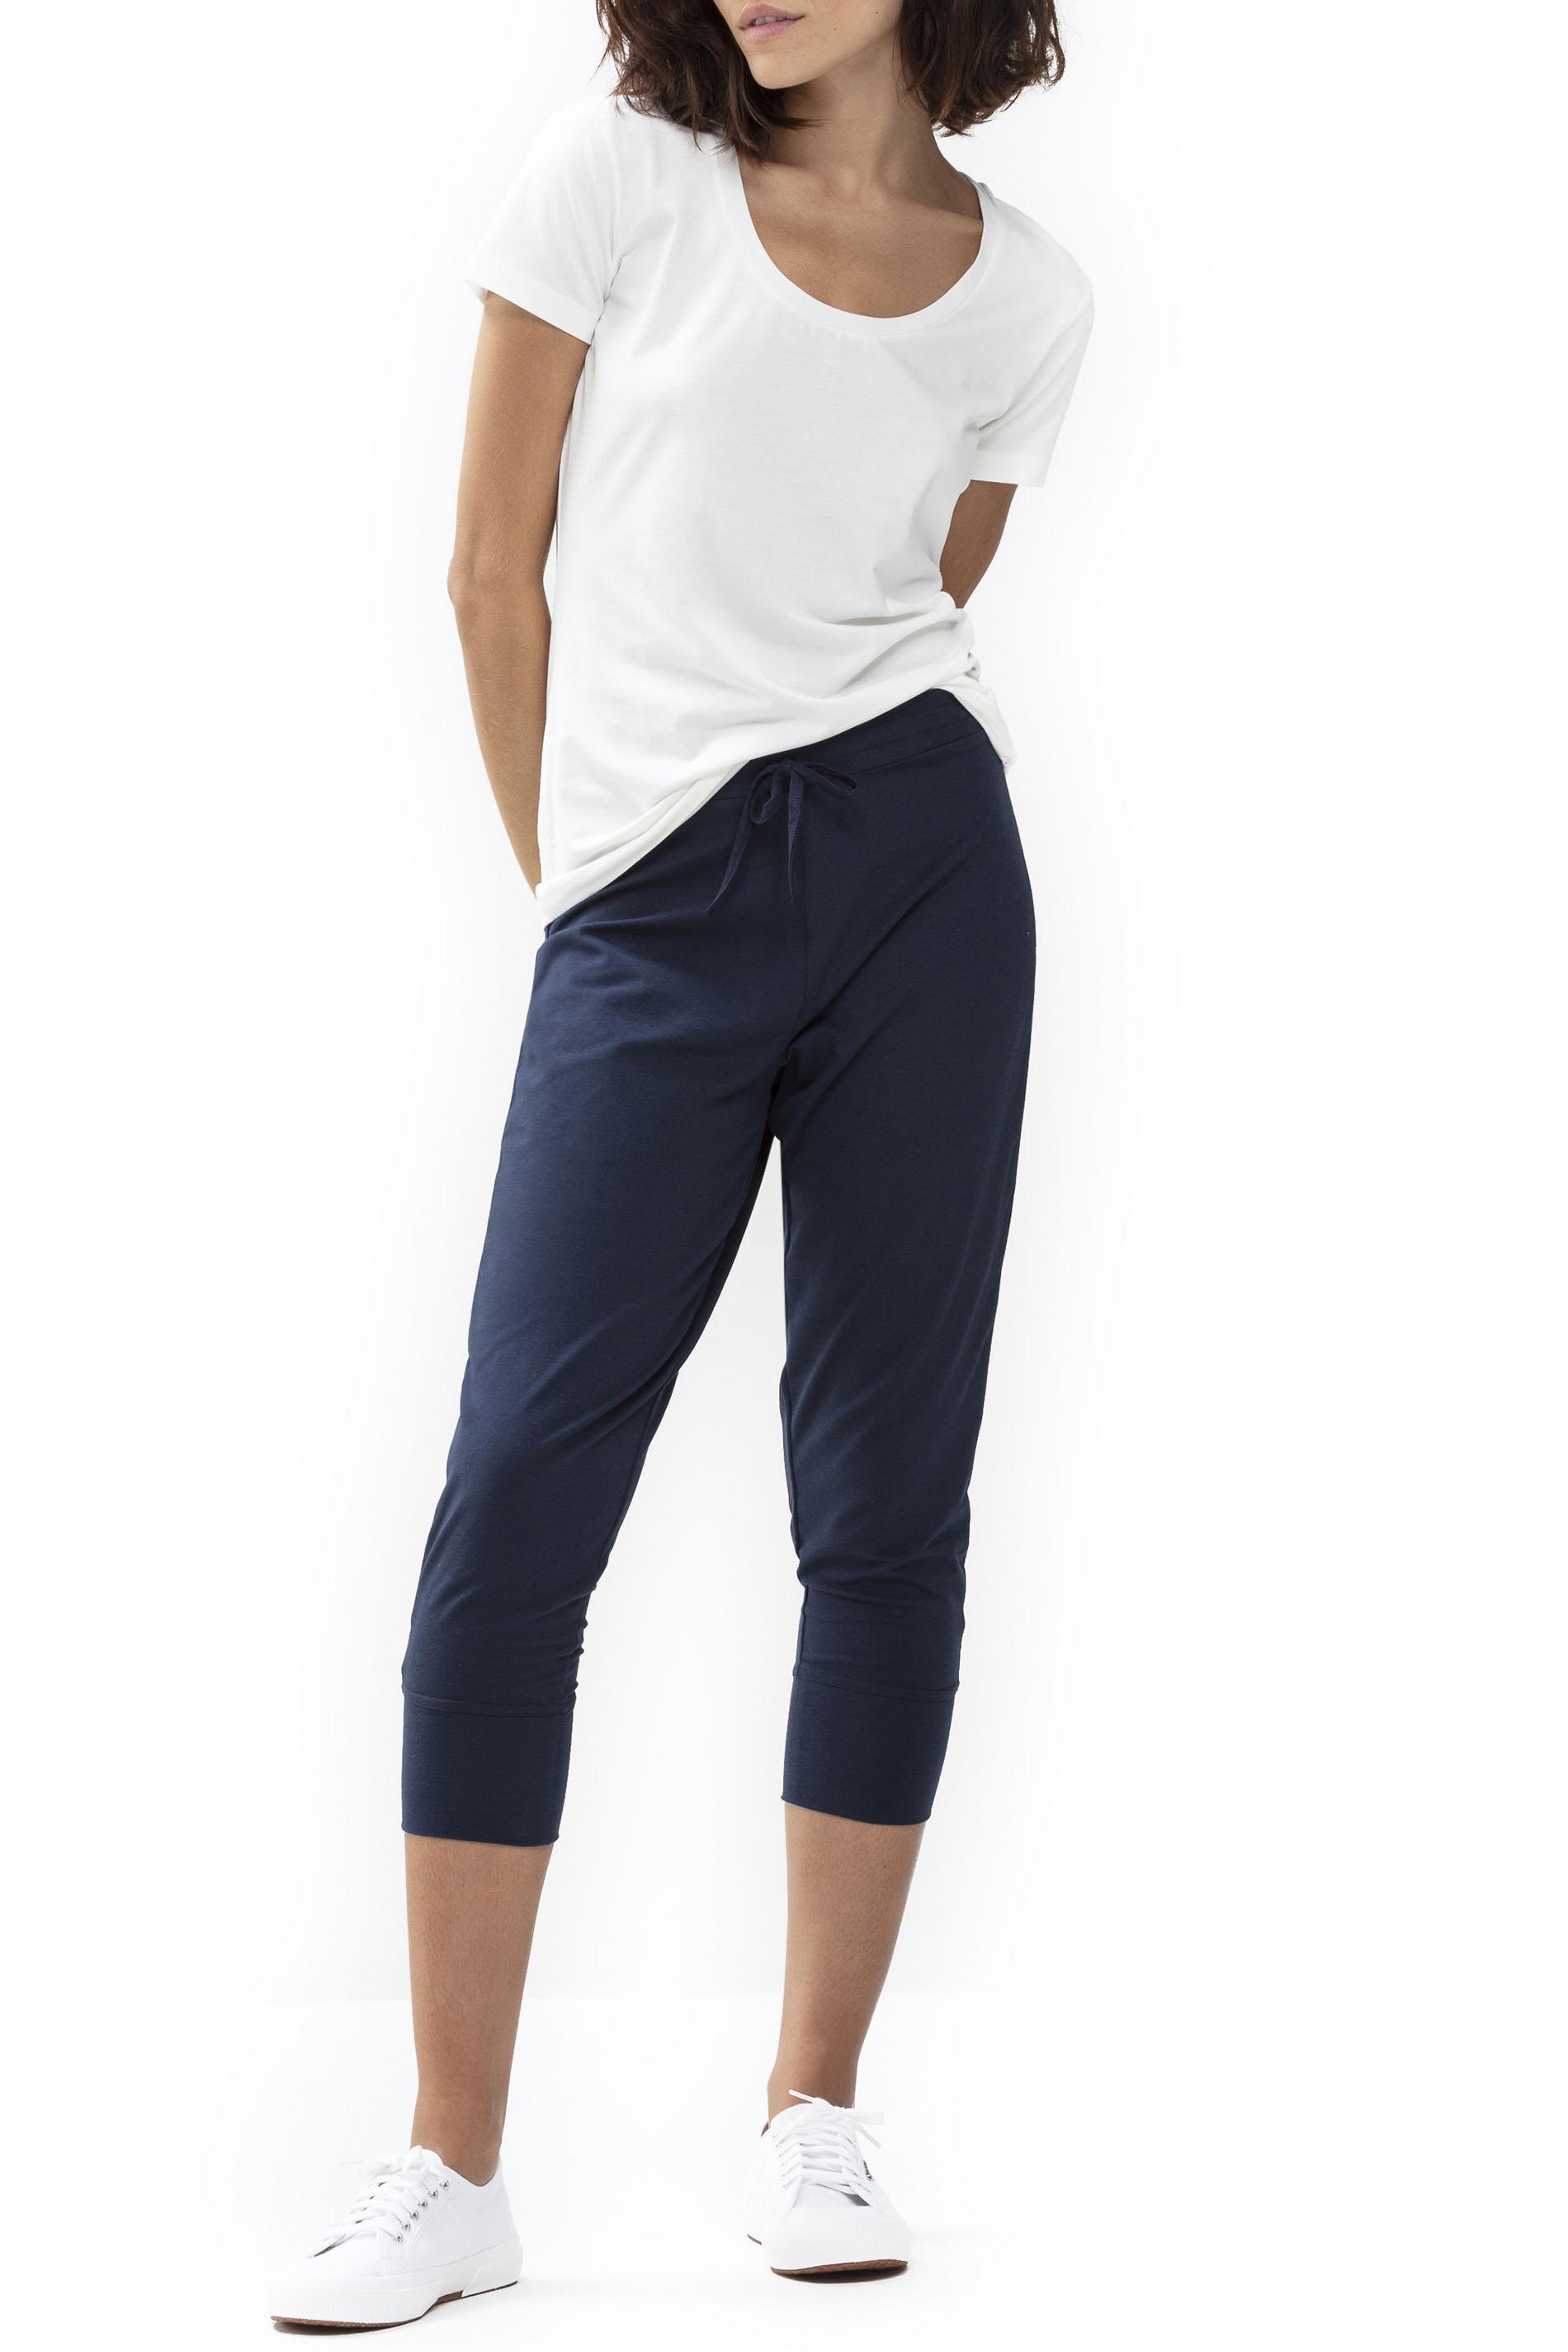 ** Demi Pants 3/4